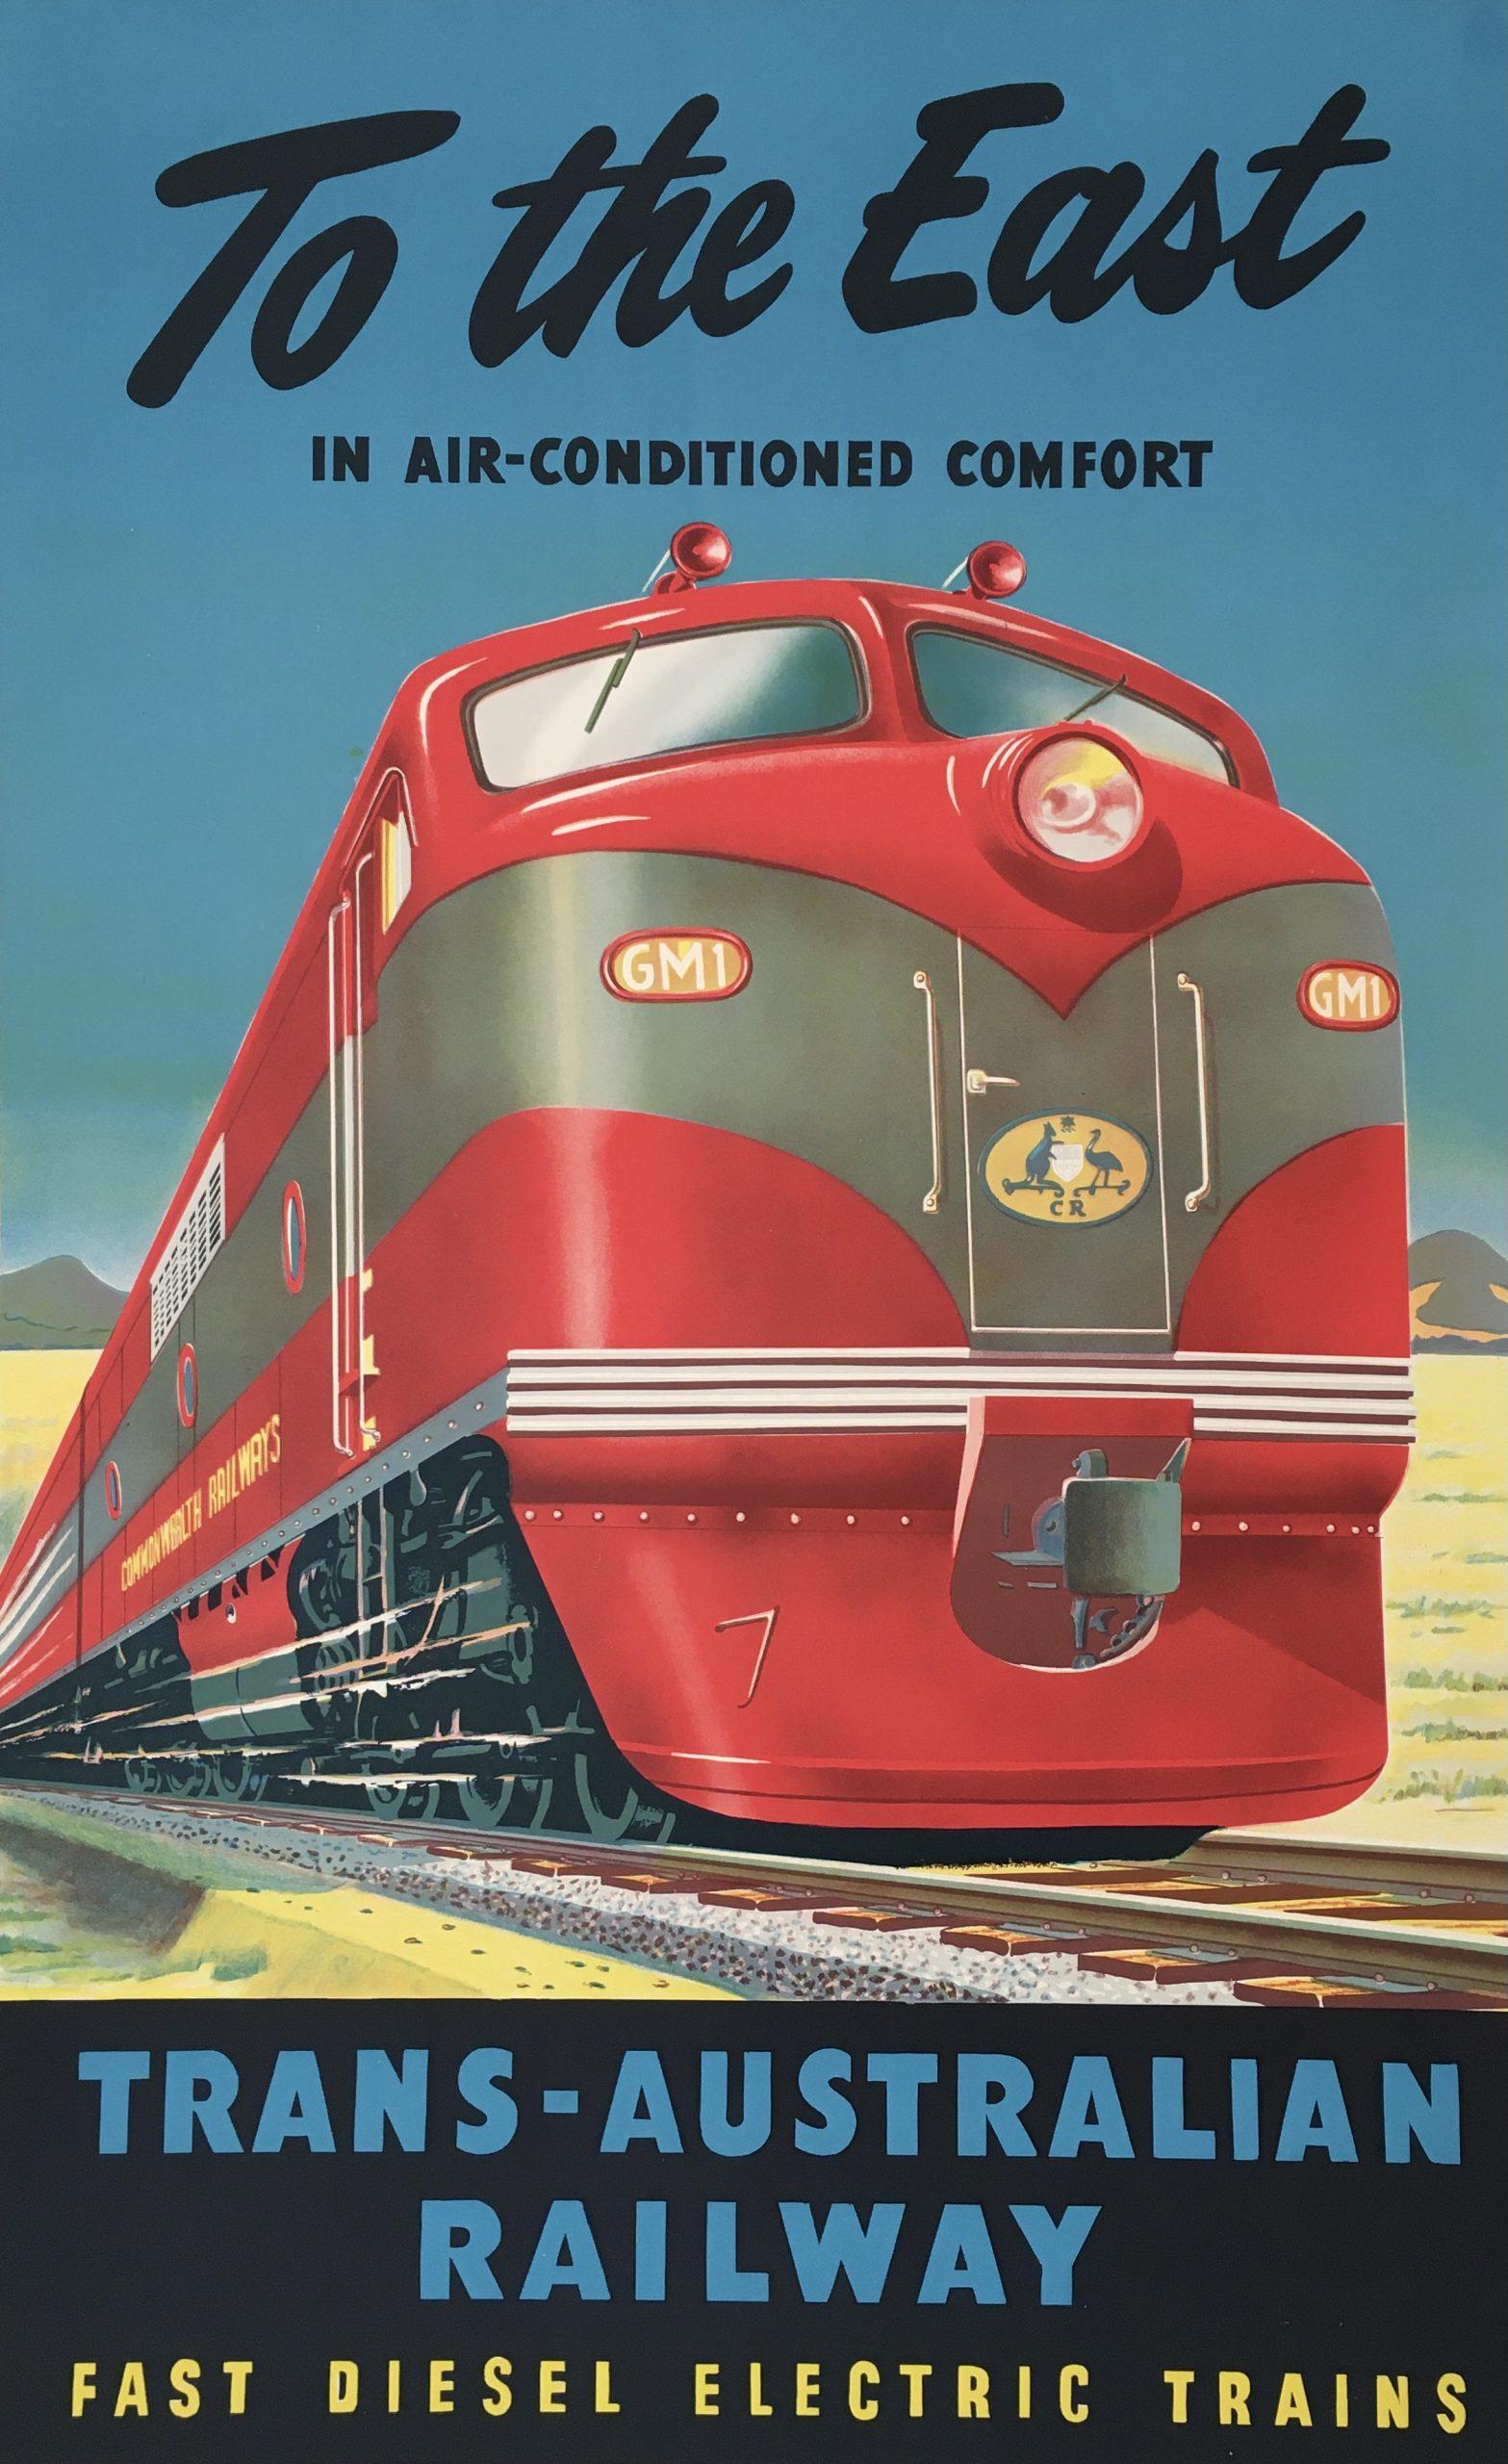 To The East Trans-Australian Railway Original Vintage Poster